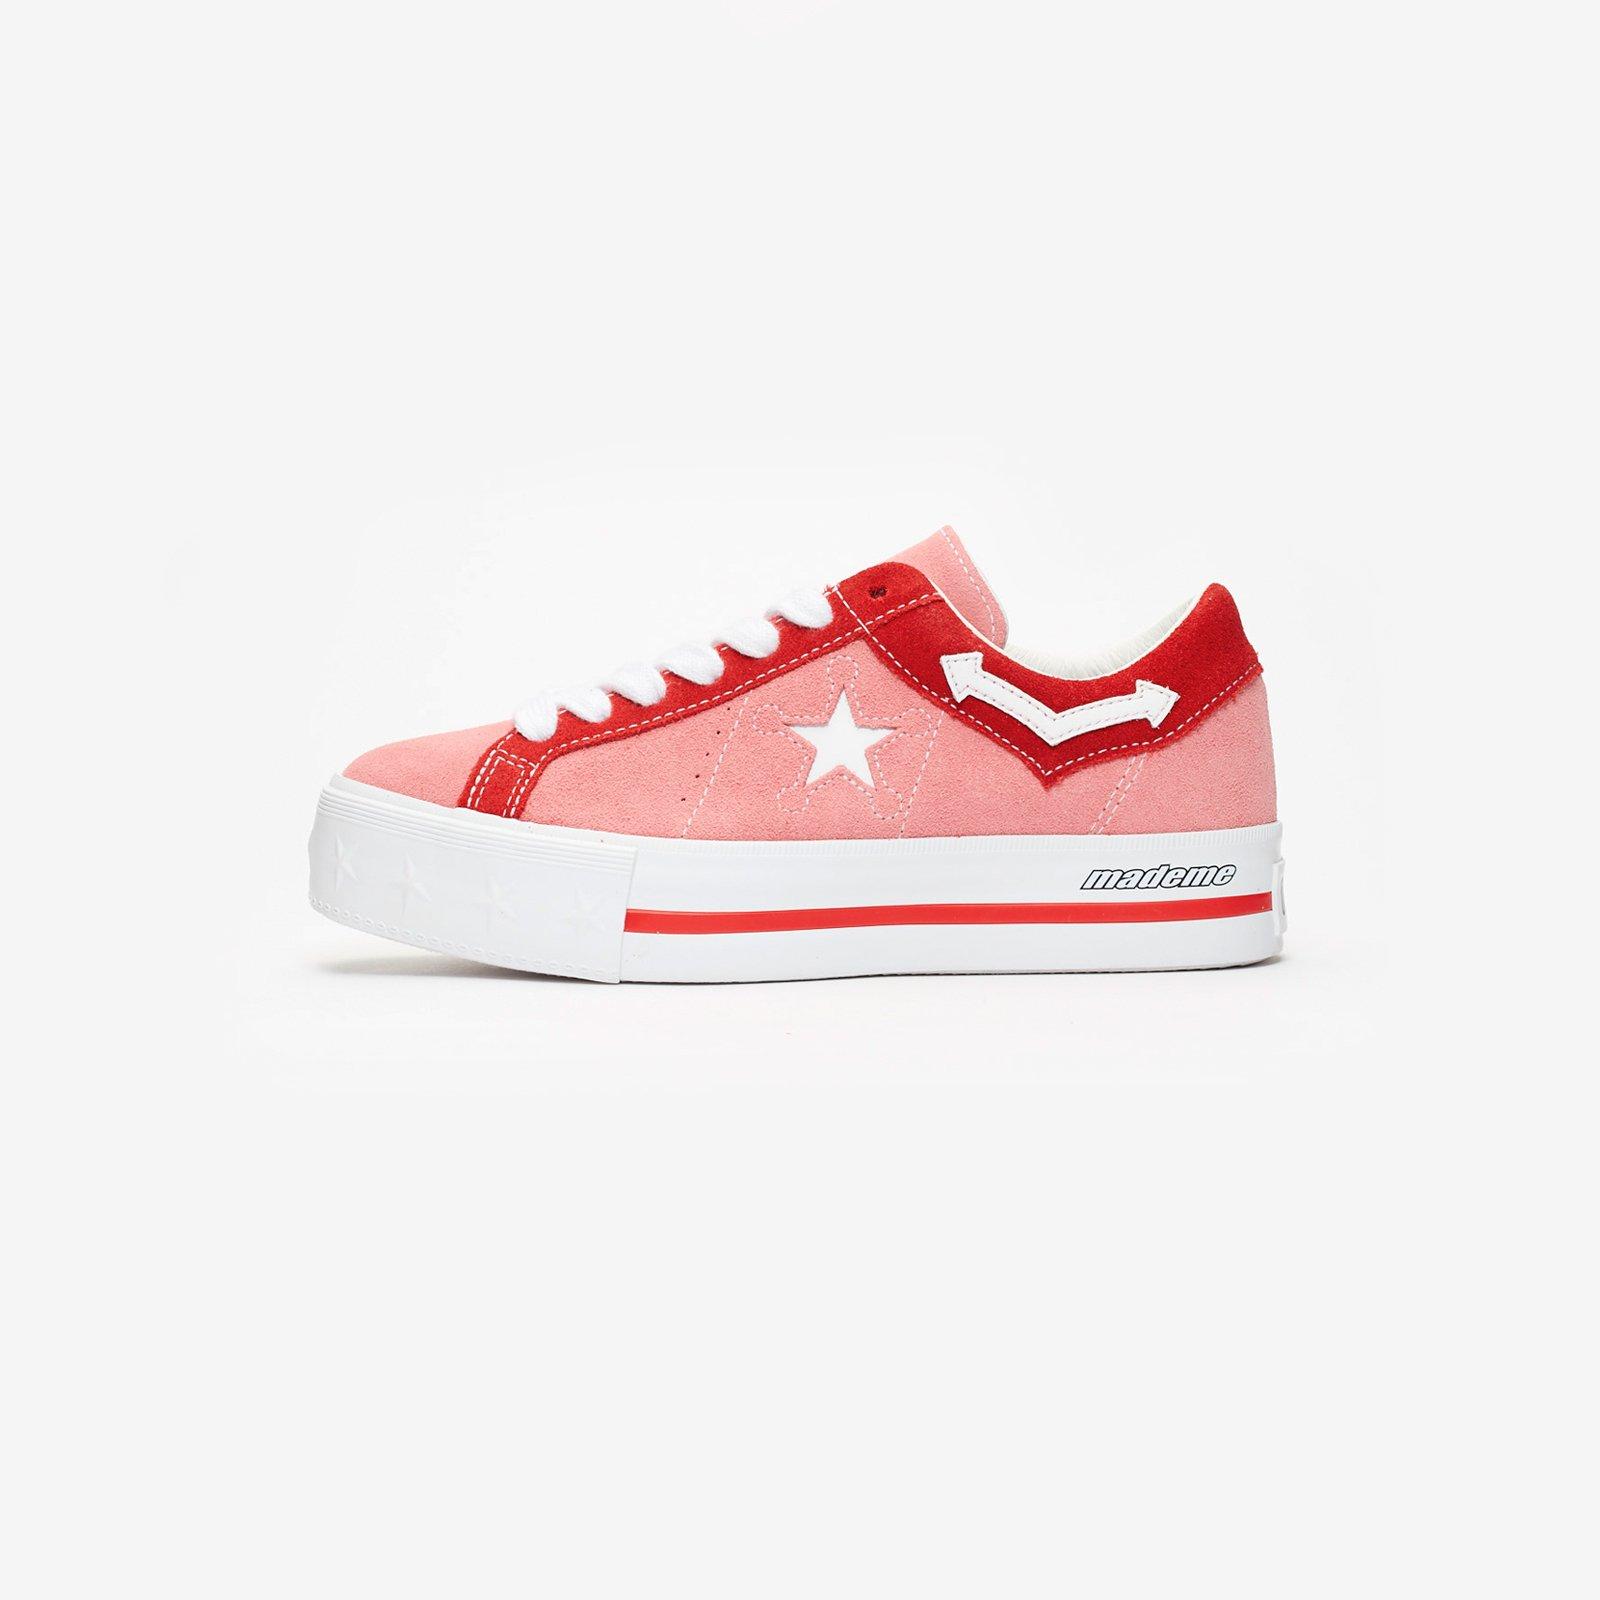 43f8632240d6 Converse One Star Platform x MadeMe - 563730c - Sneakersnstuff I Sneakers    Streetwear online seit 1999